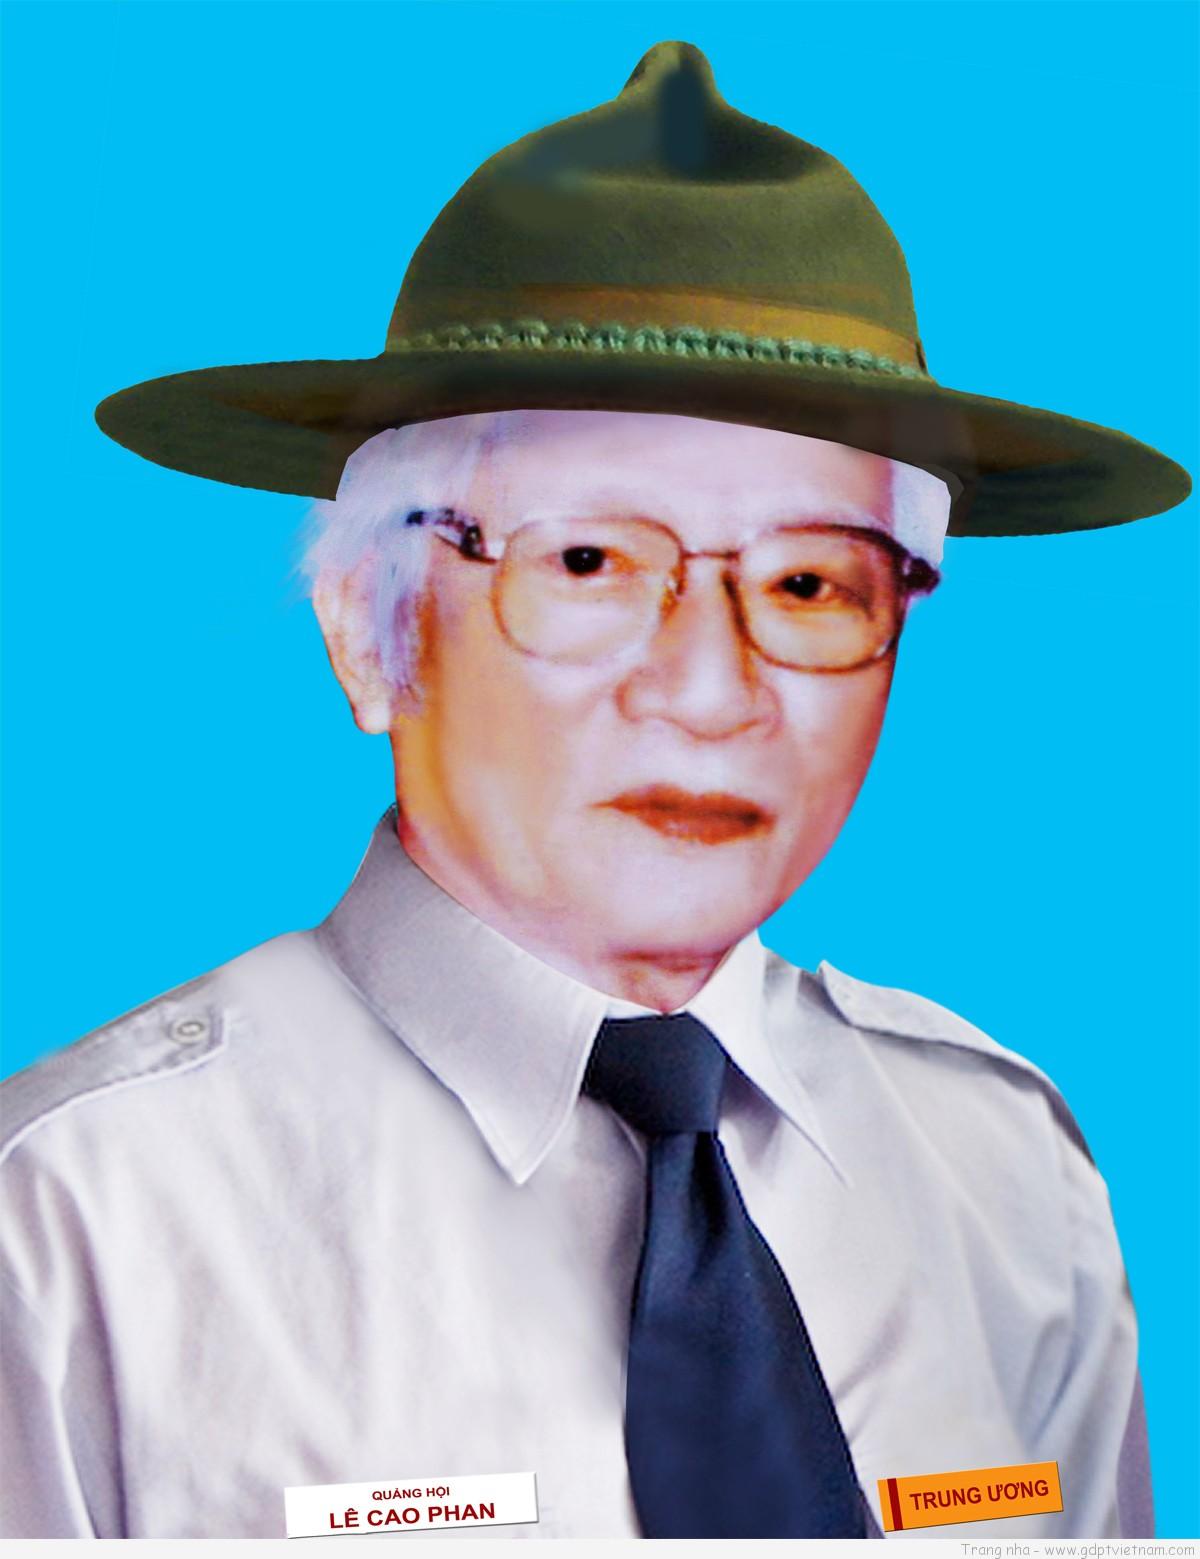 Quang Hoi - Le Cao Phan